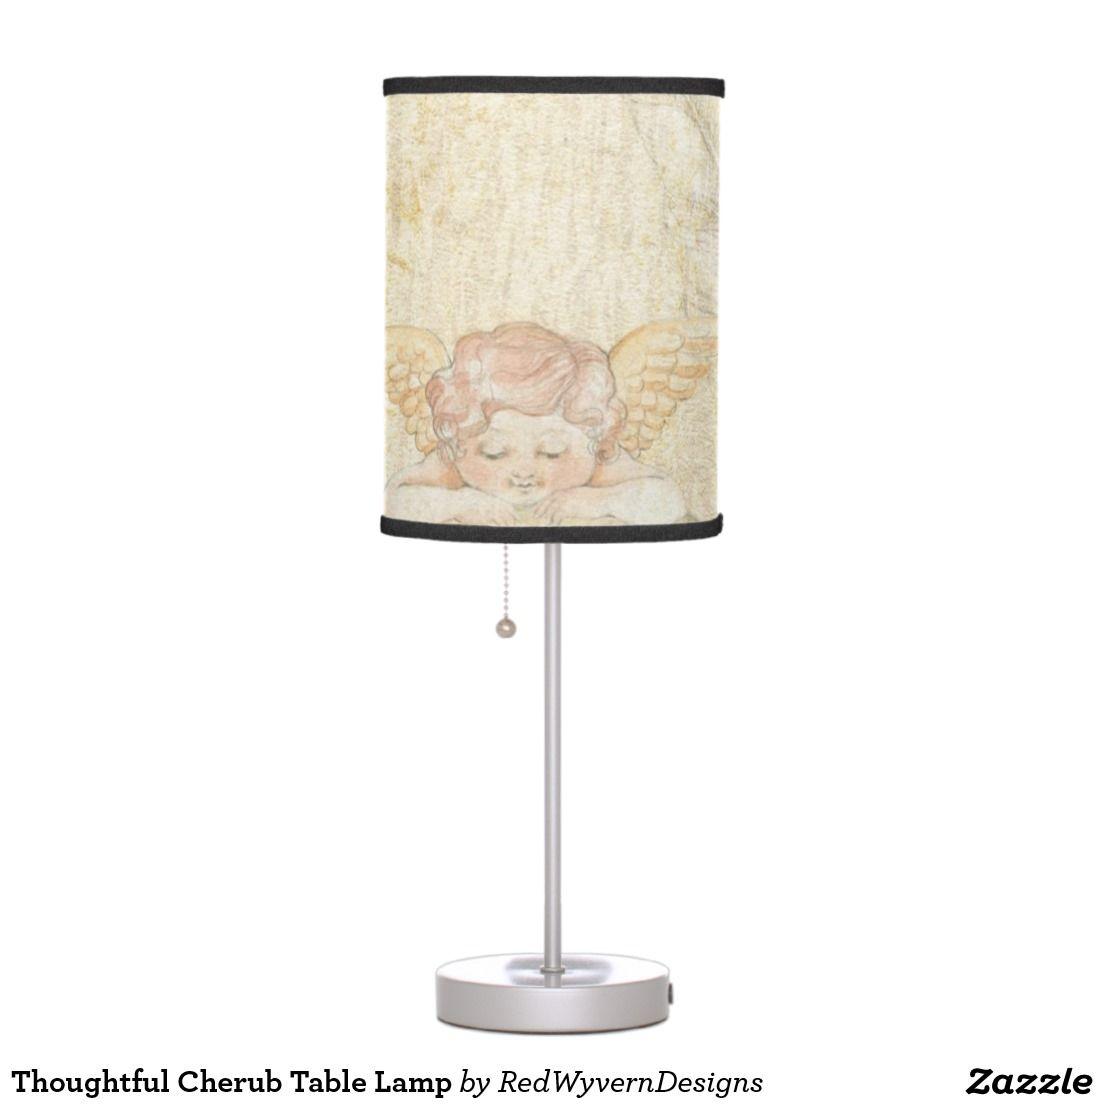 Thoughtful cherub table lamp cherub table lamps and lamps thoughtful cherub table lamp geotapseo Images